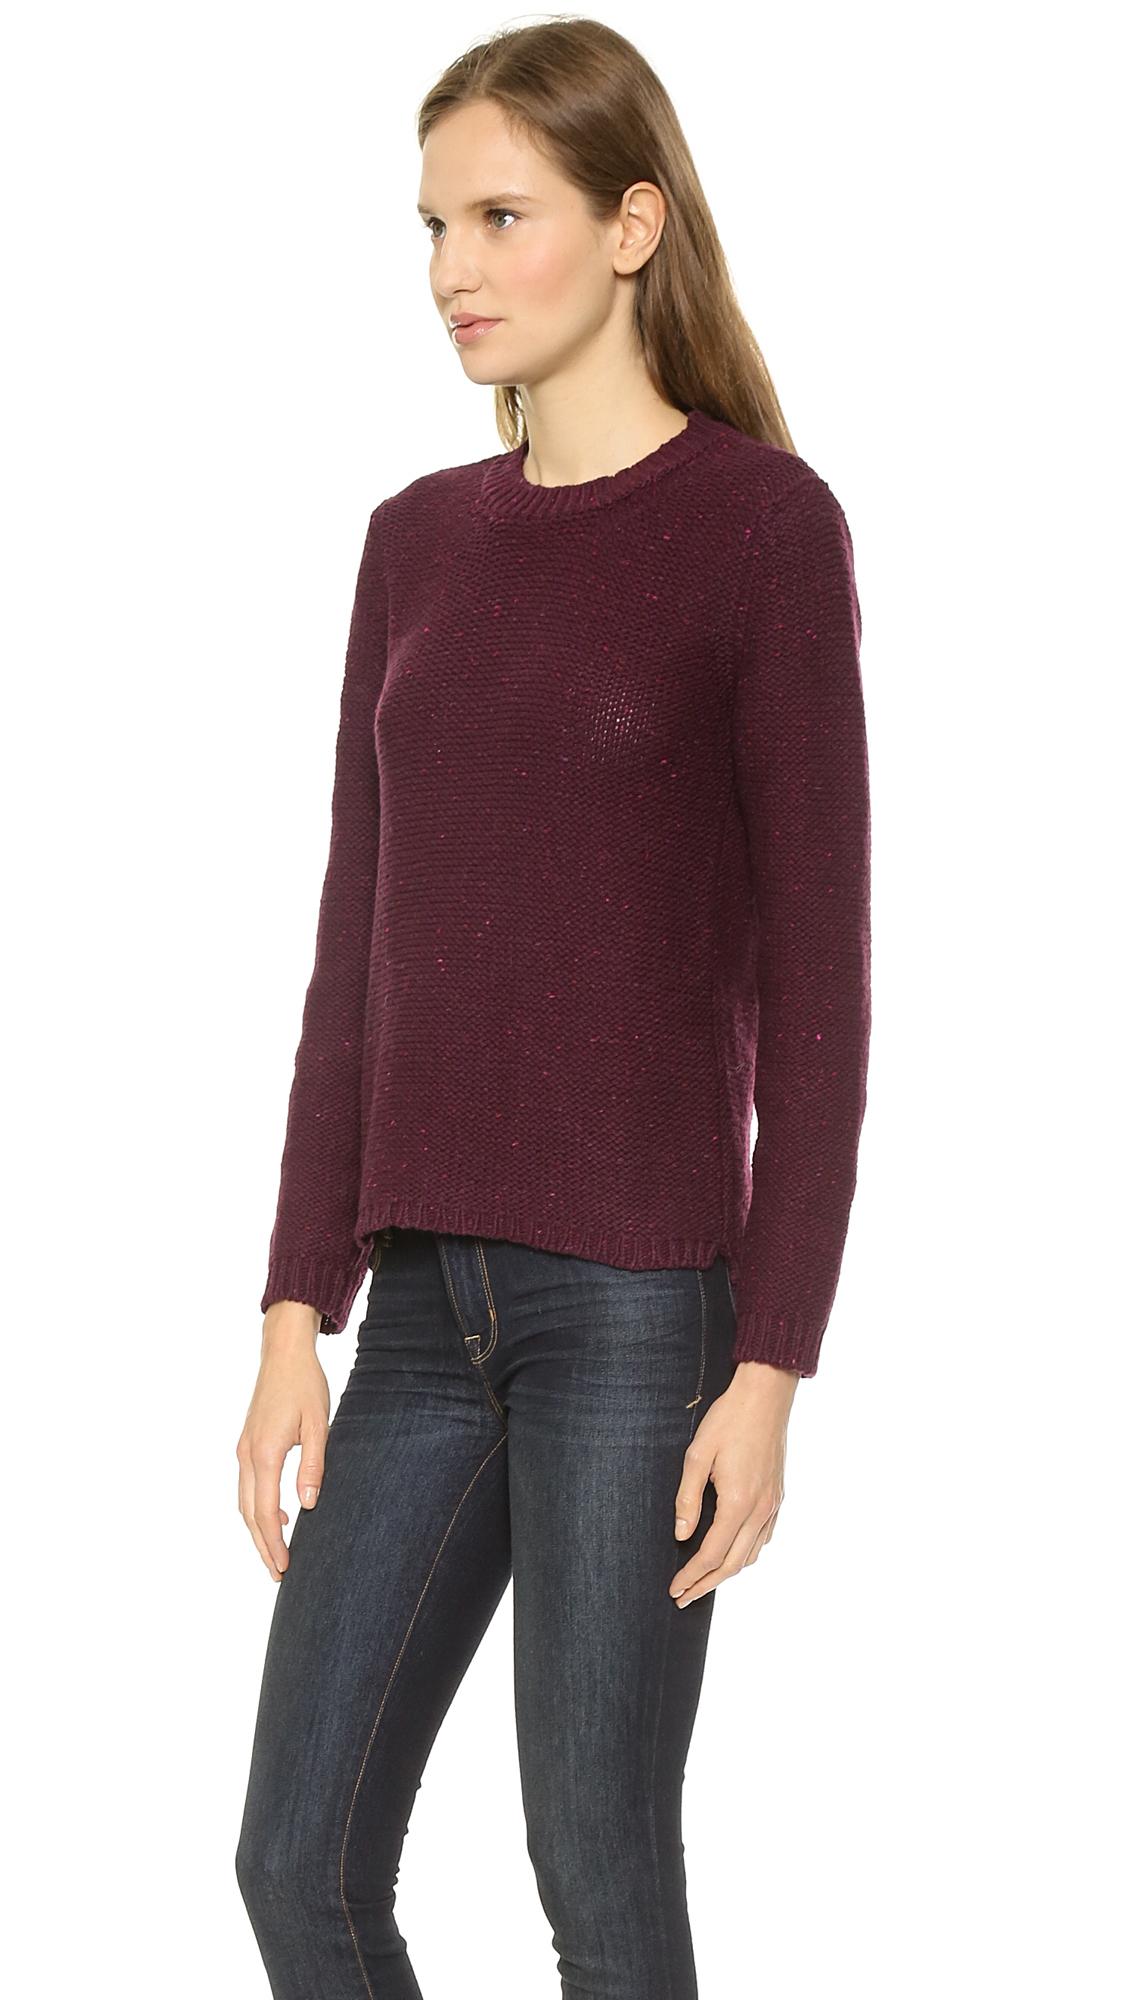 lyst a p c mariniere femme pullover sweater merlot in purple. Black Bedroom Furniture Sets. Home Design Ideas